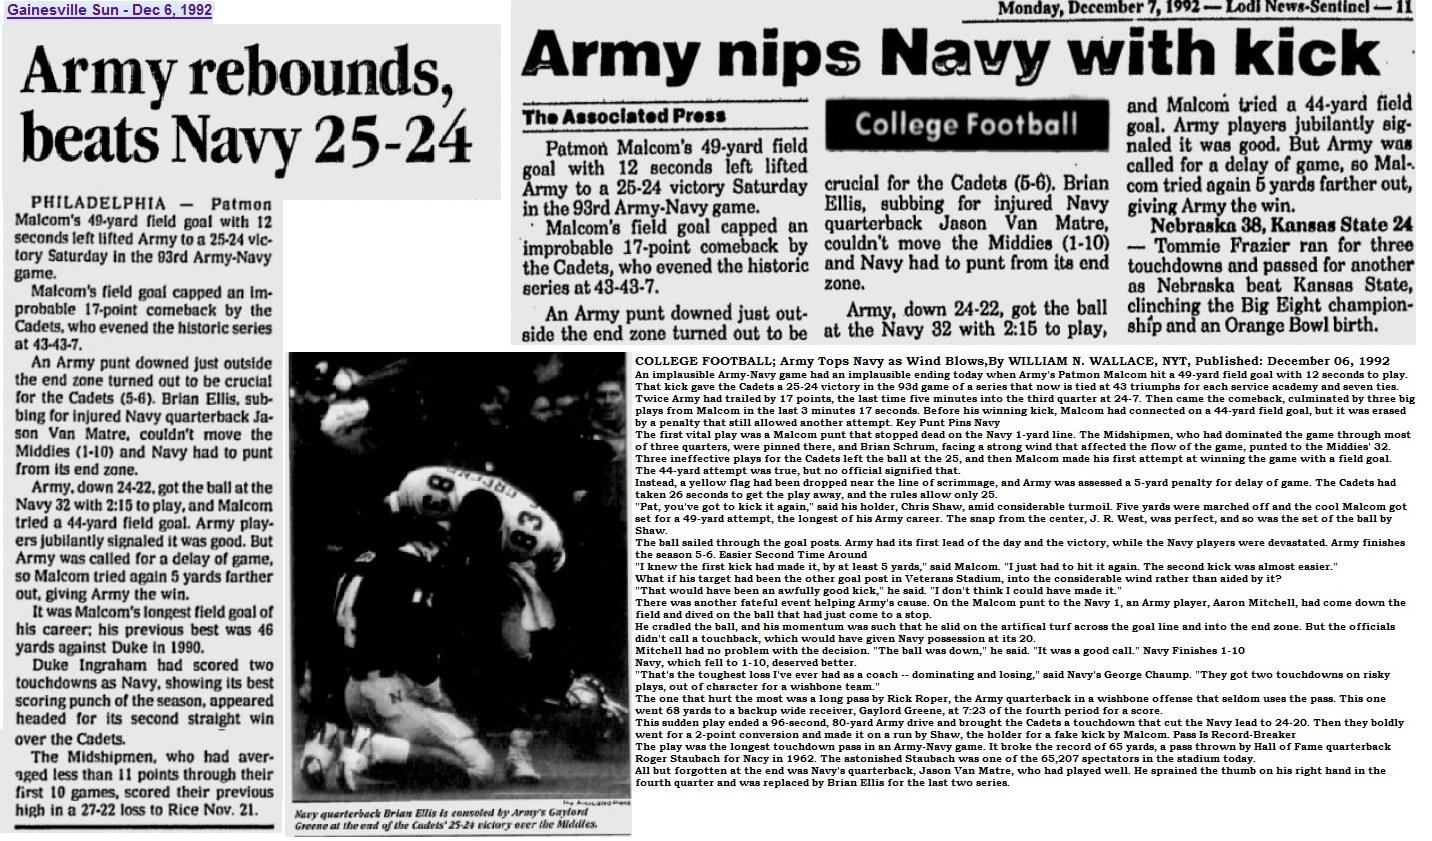 armyfb_1992_vsnavy_various_dec1992